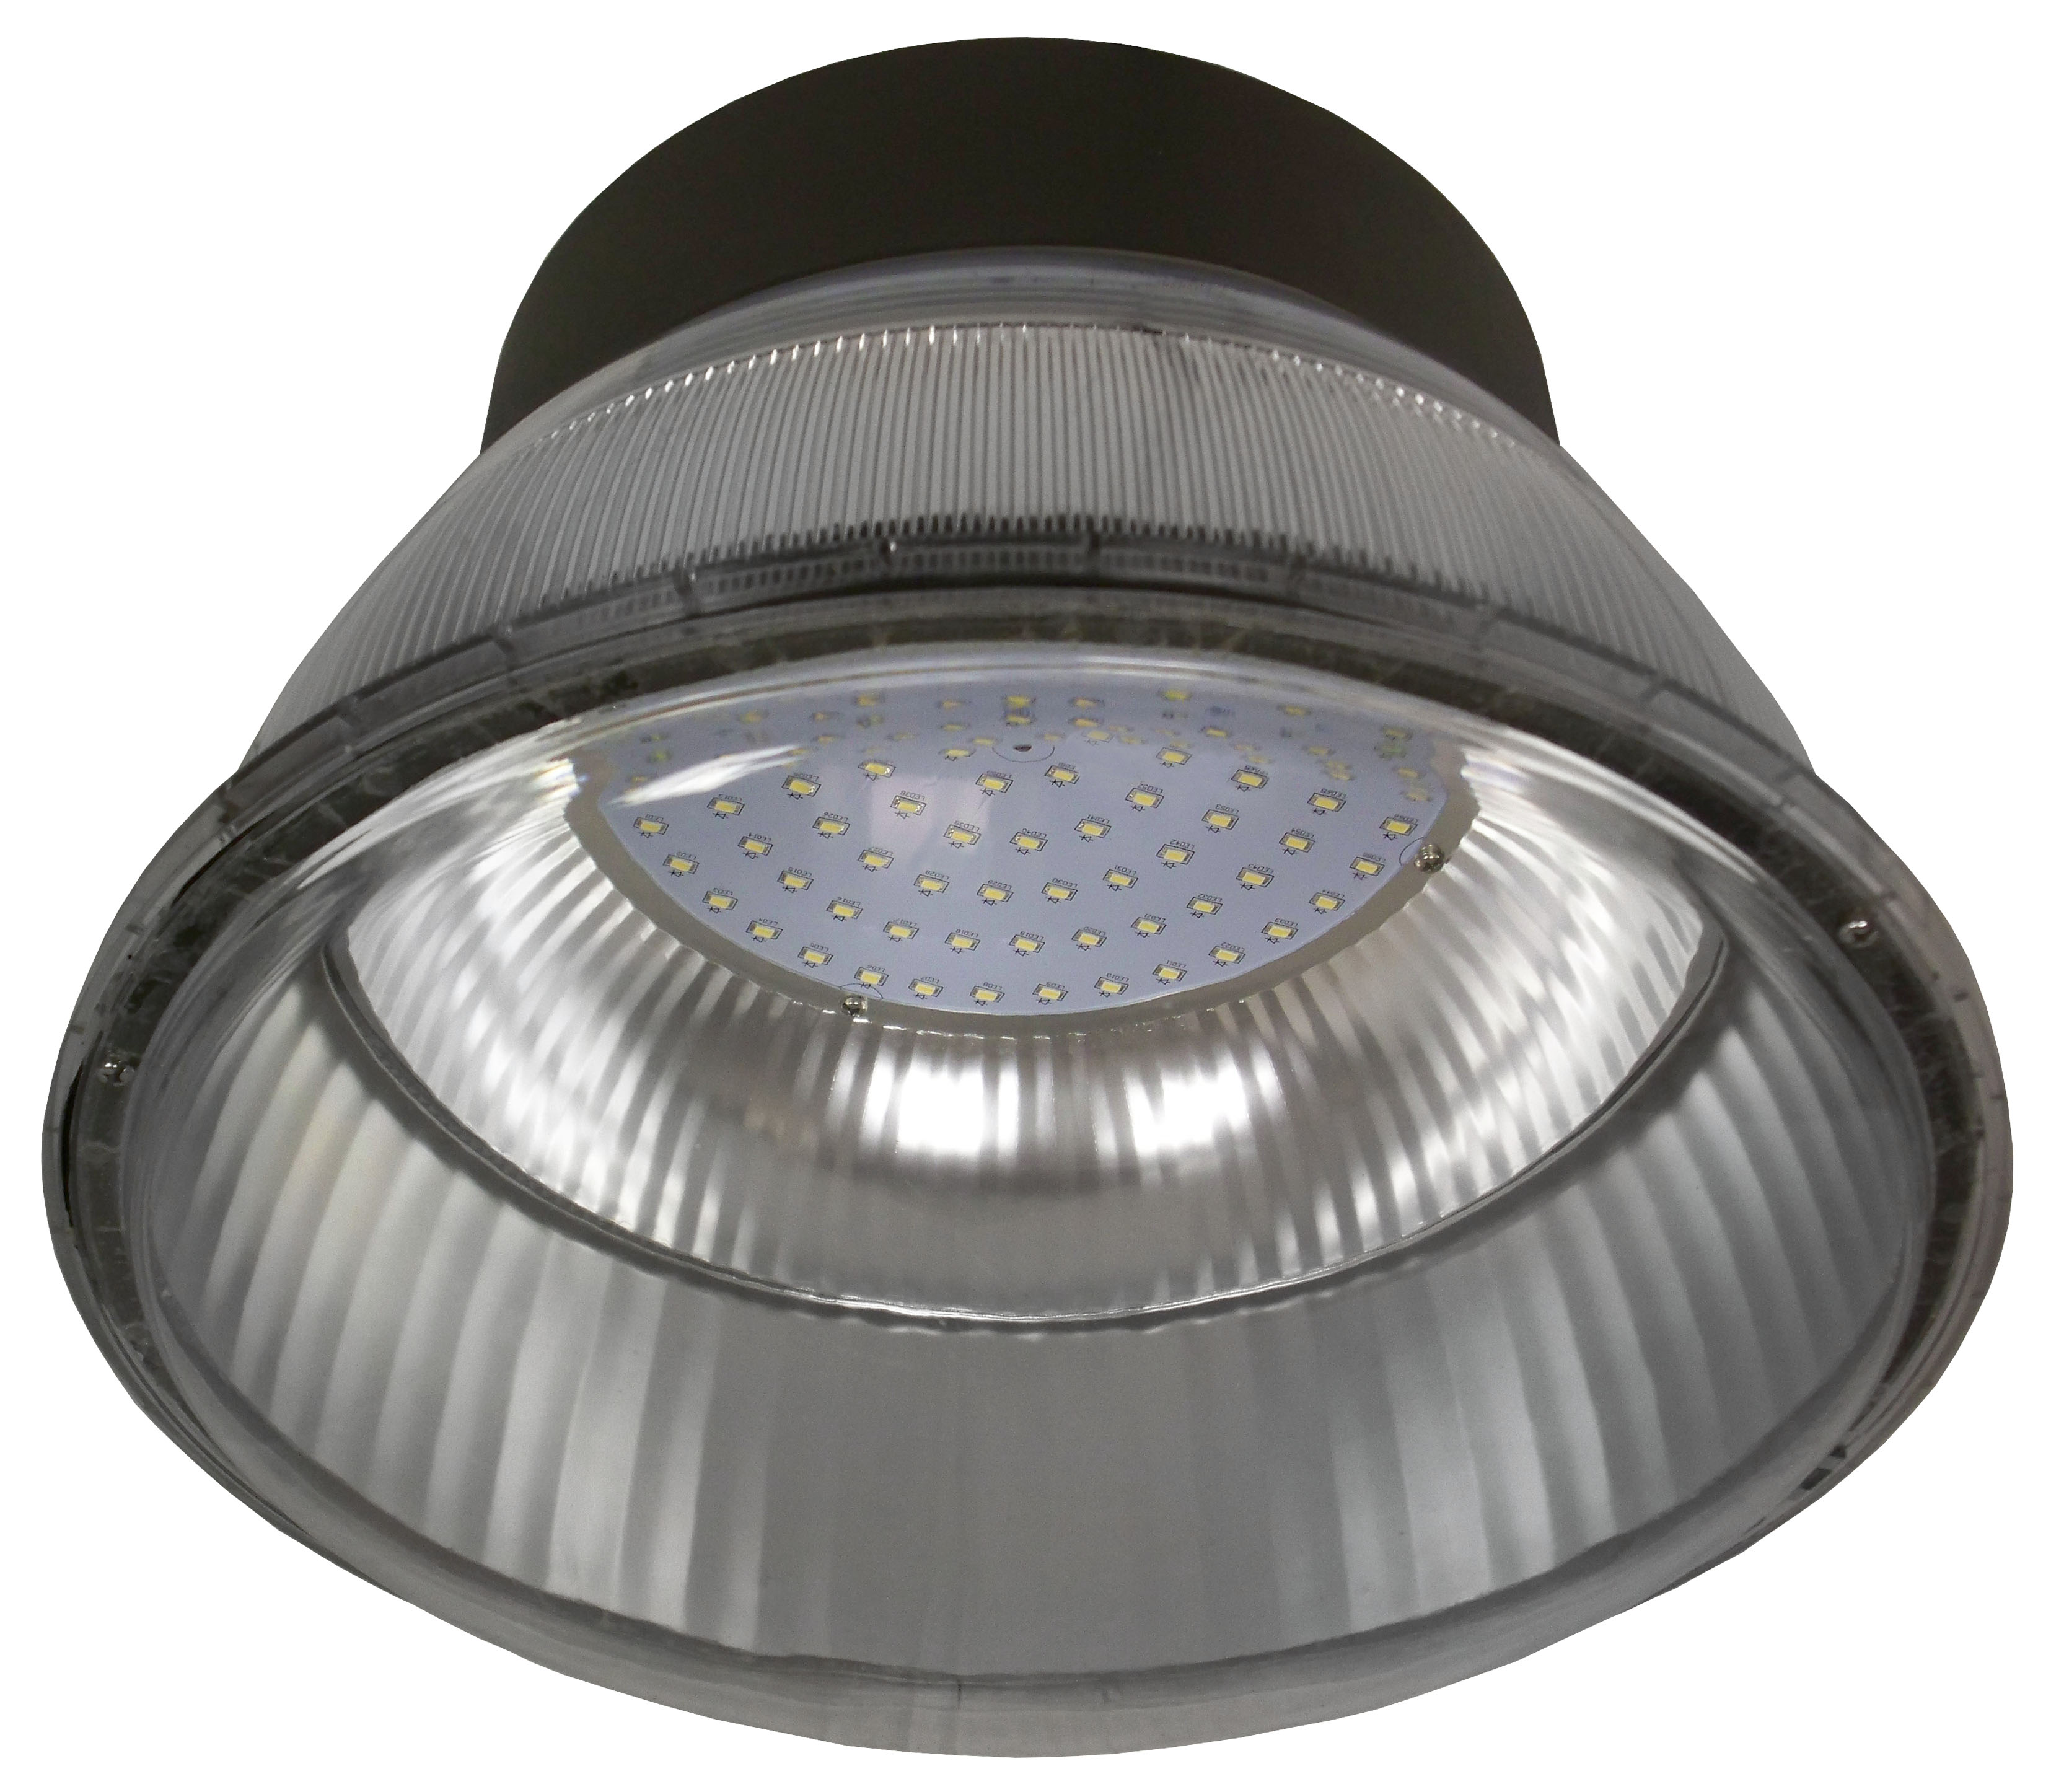 Larson Electronics LLC Releases A New LED Garage Light